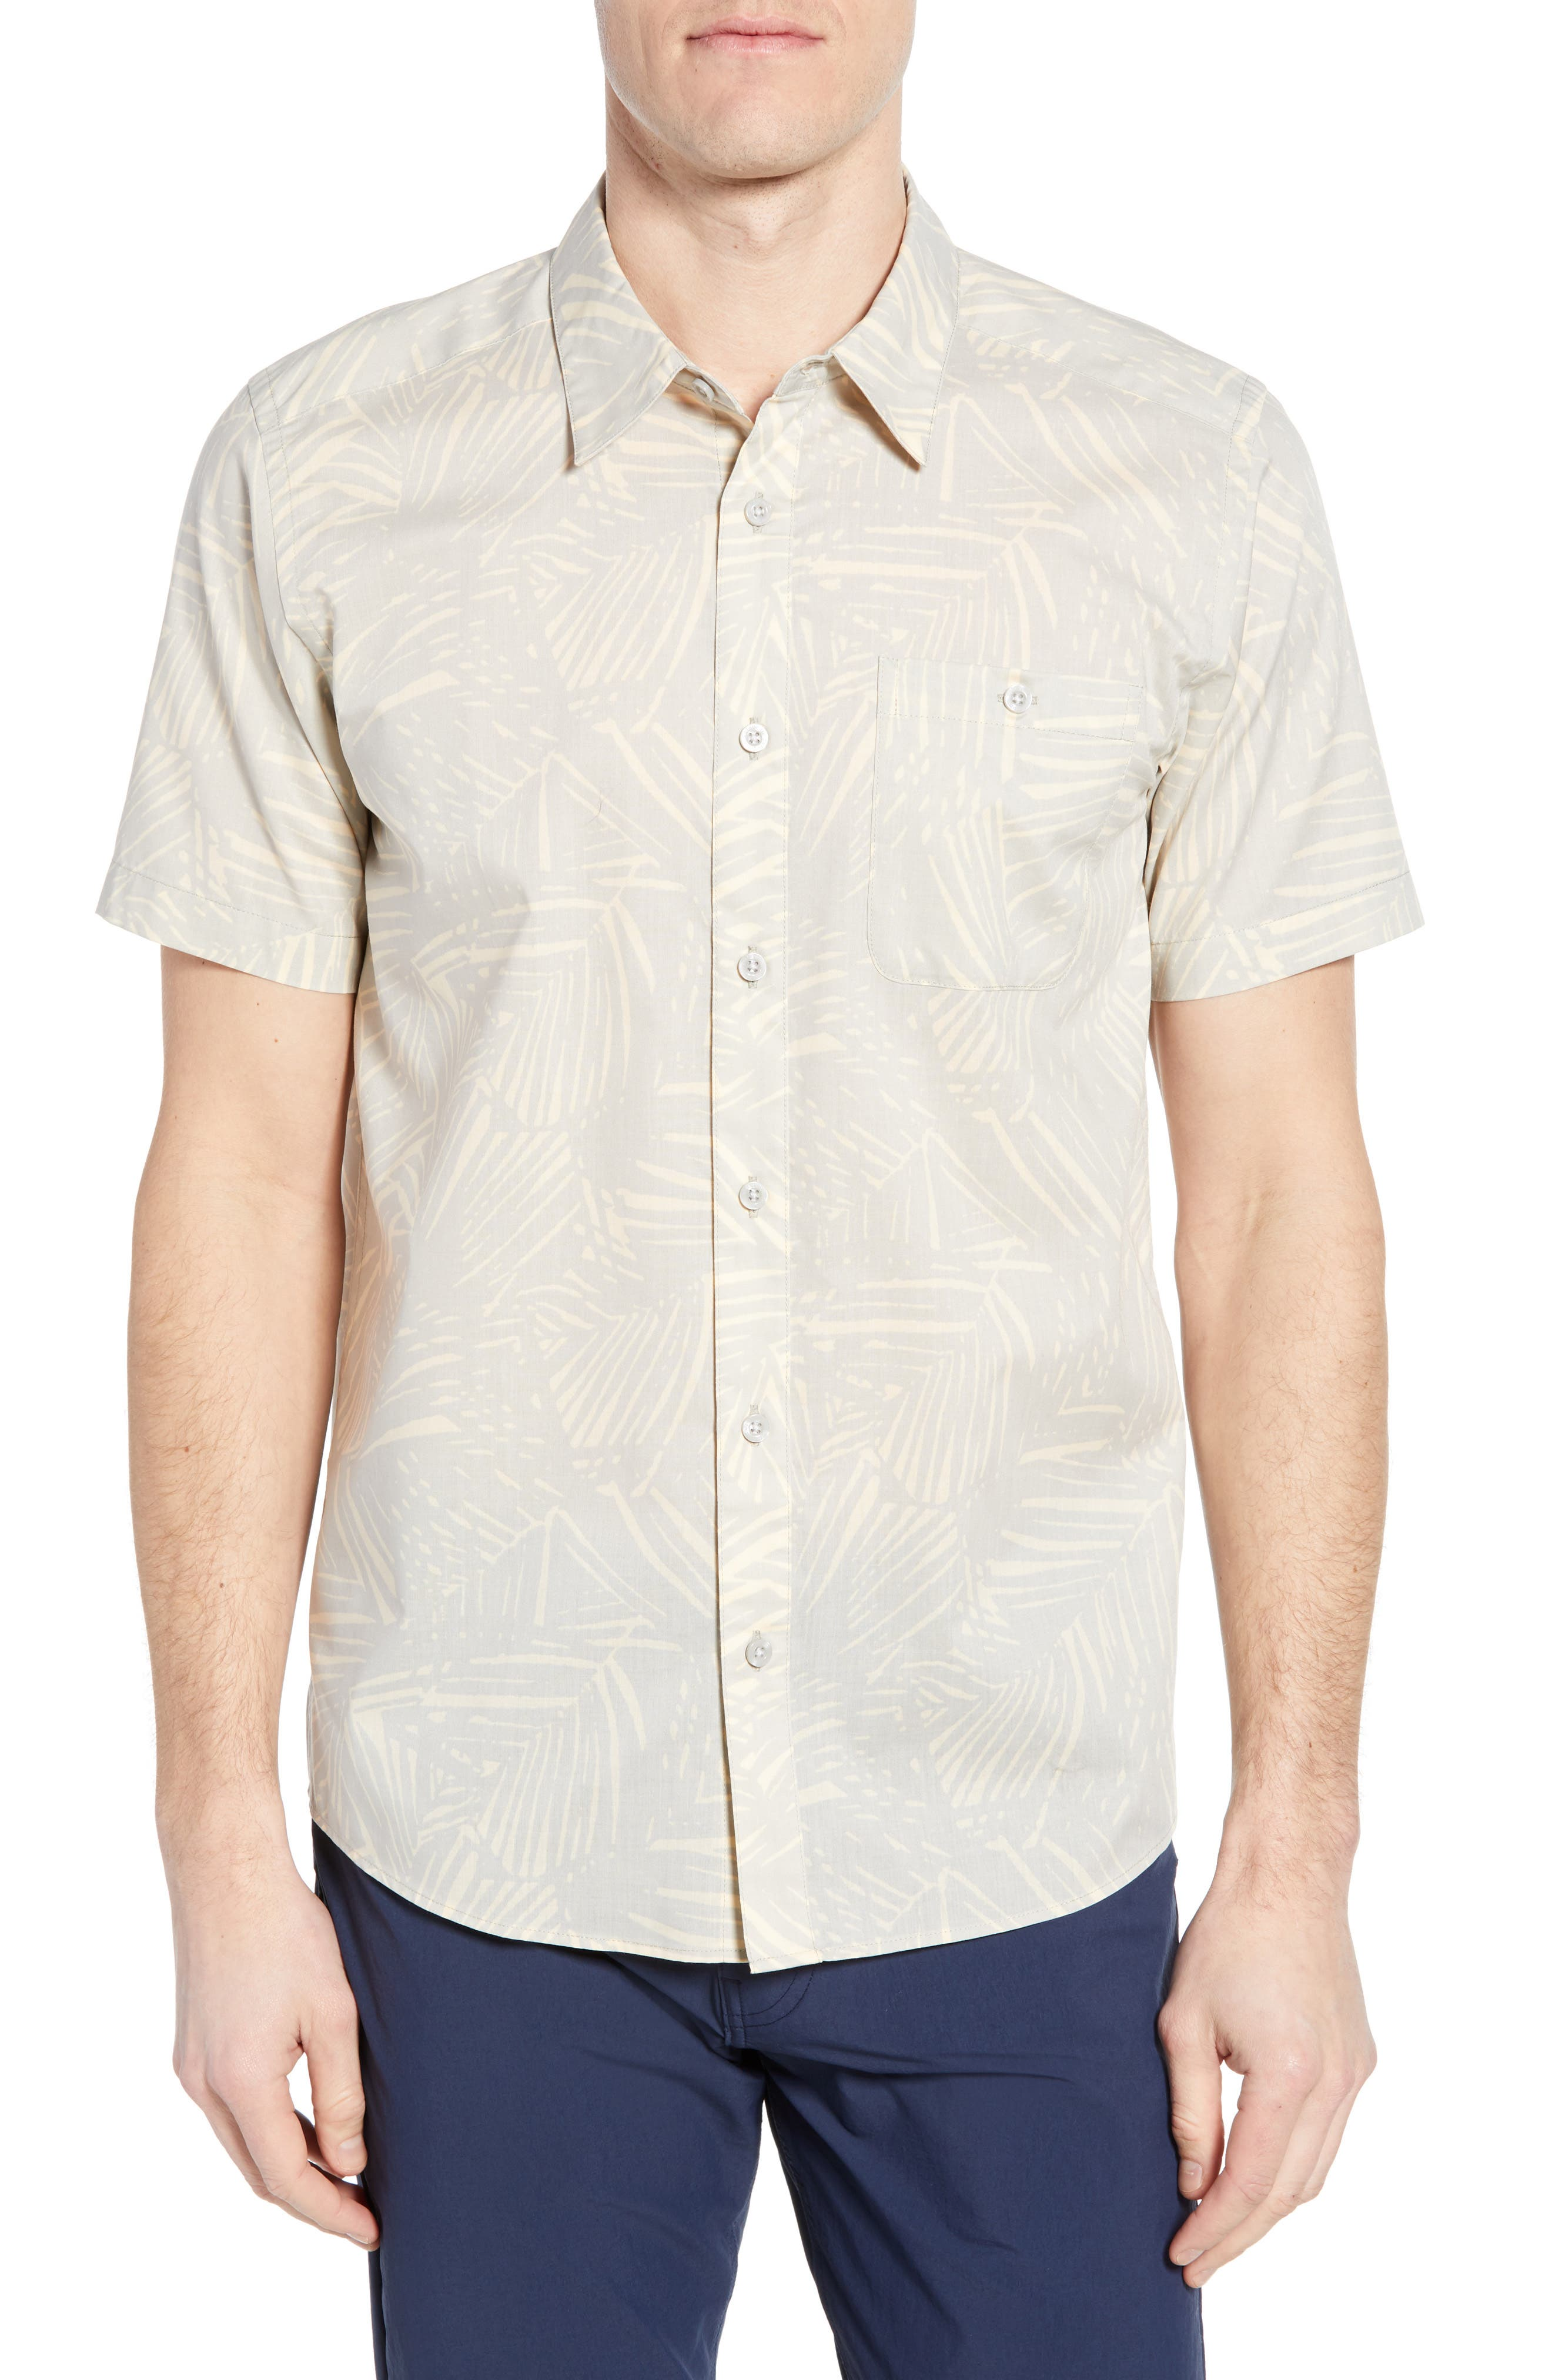 Patagonia Go To Regular Fit Short Sleeve Sport Shirt, Grey